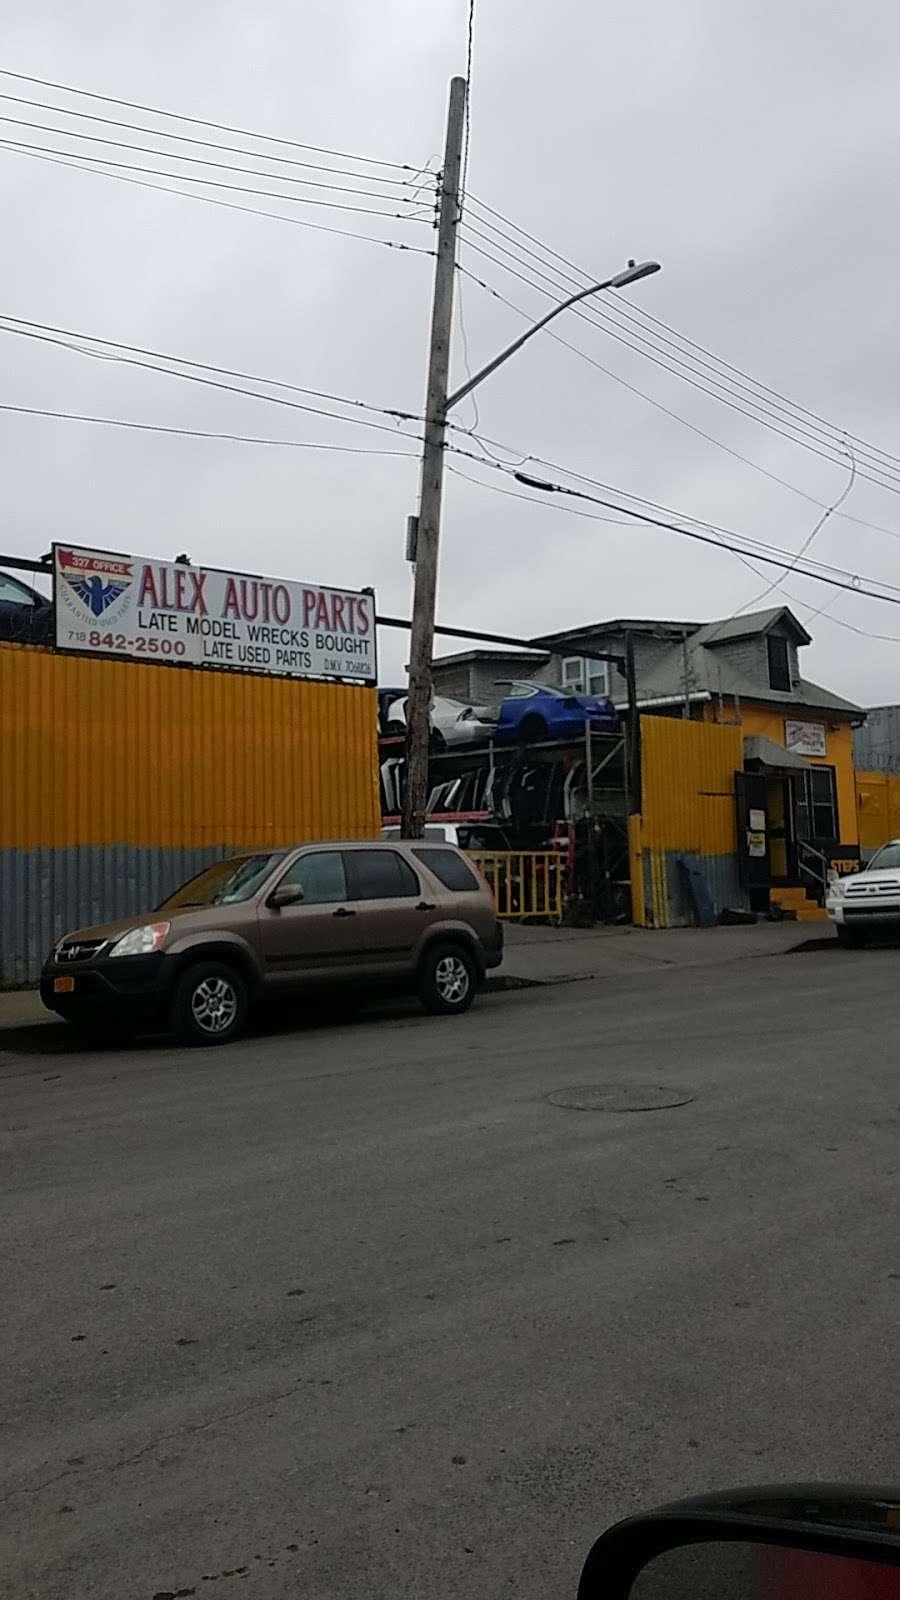 Alex Auto Parts - car repair  | Photo 2 of 2 | Address: 327 Bryant Ave, Bronx, NY 10474, USA | Phone: (718) 842-2500